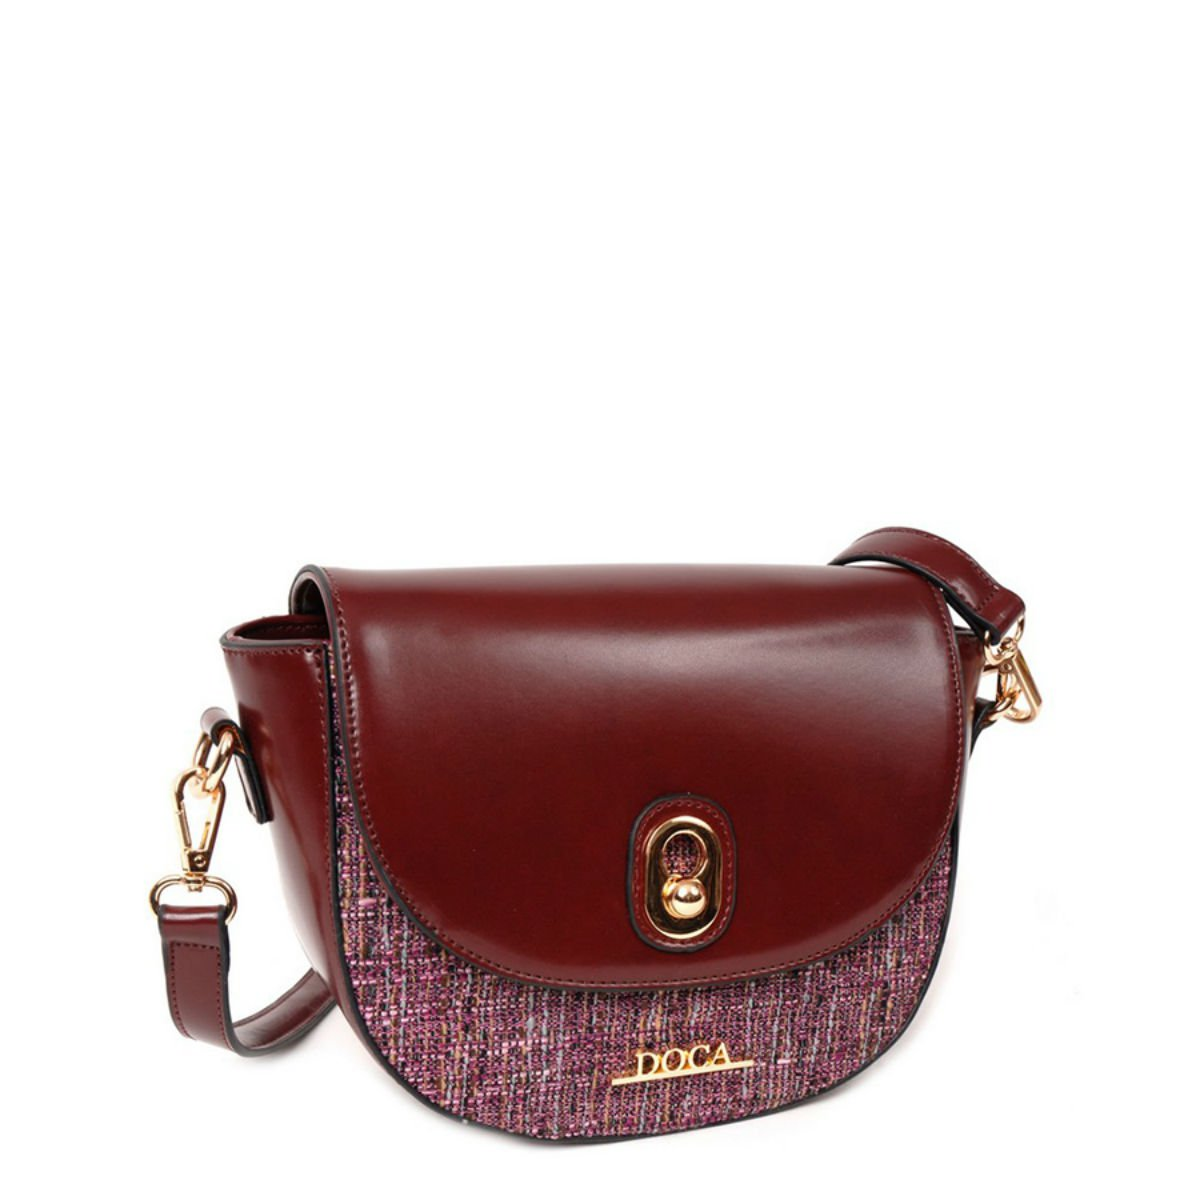 Červená lesklá kabelka DOCA - Glamour